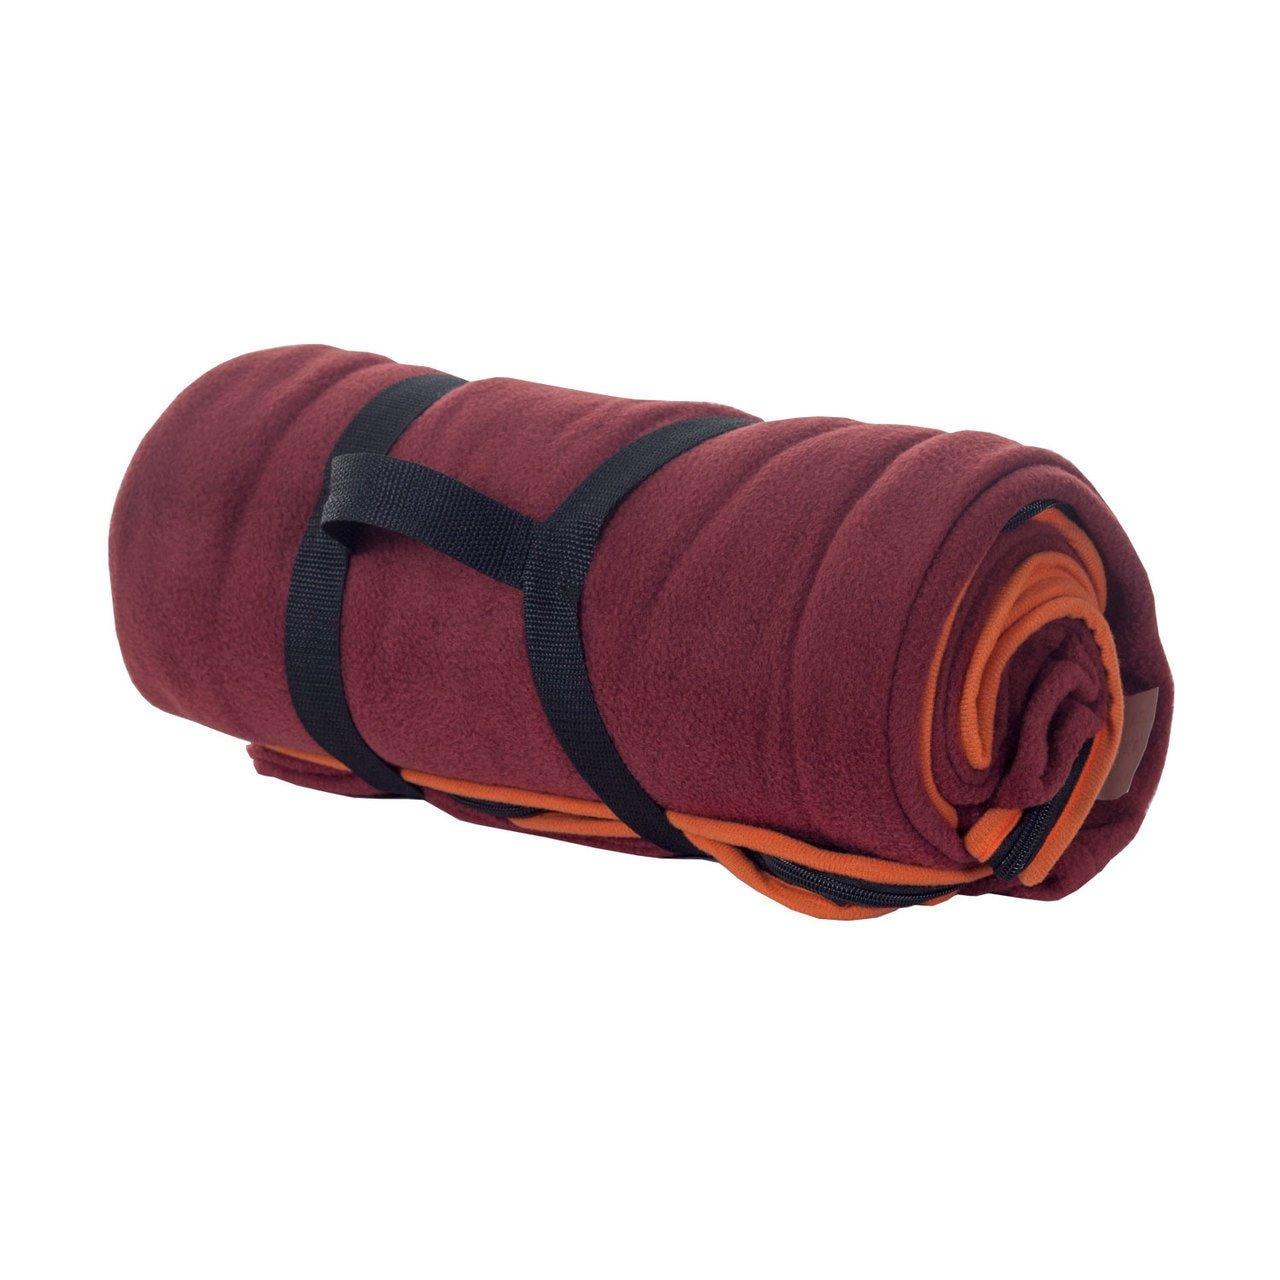 Fleece Sleeping Bag Liner by Emergency Essentials